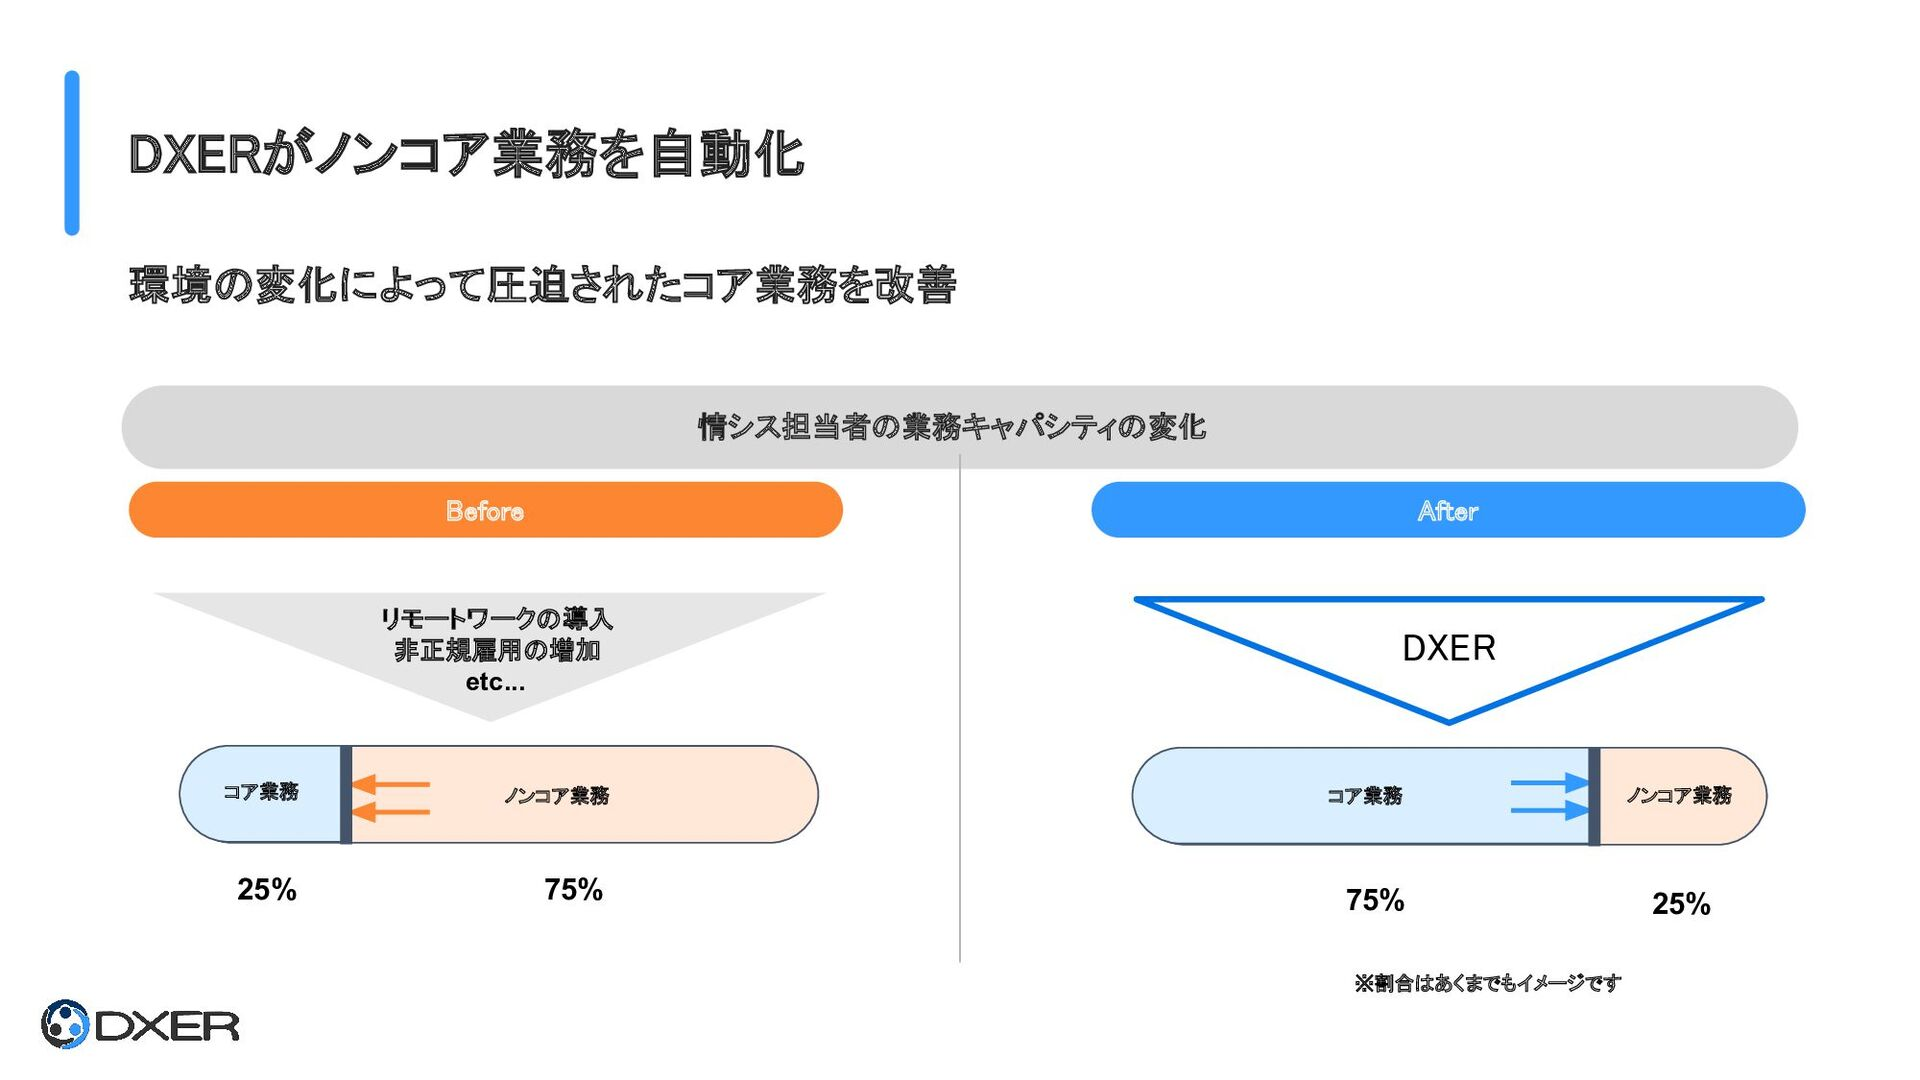 DXERがノンコア業務を自動化 ノンコア業務 コア業務 75% リモートワークの導入 非...